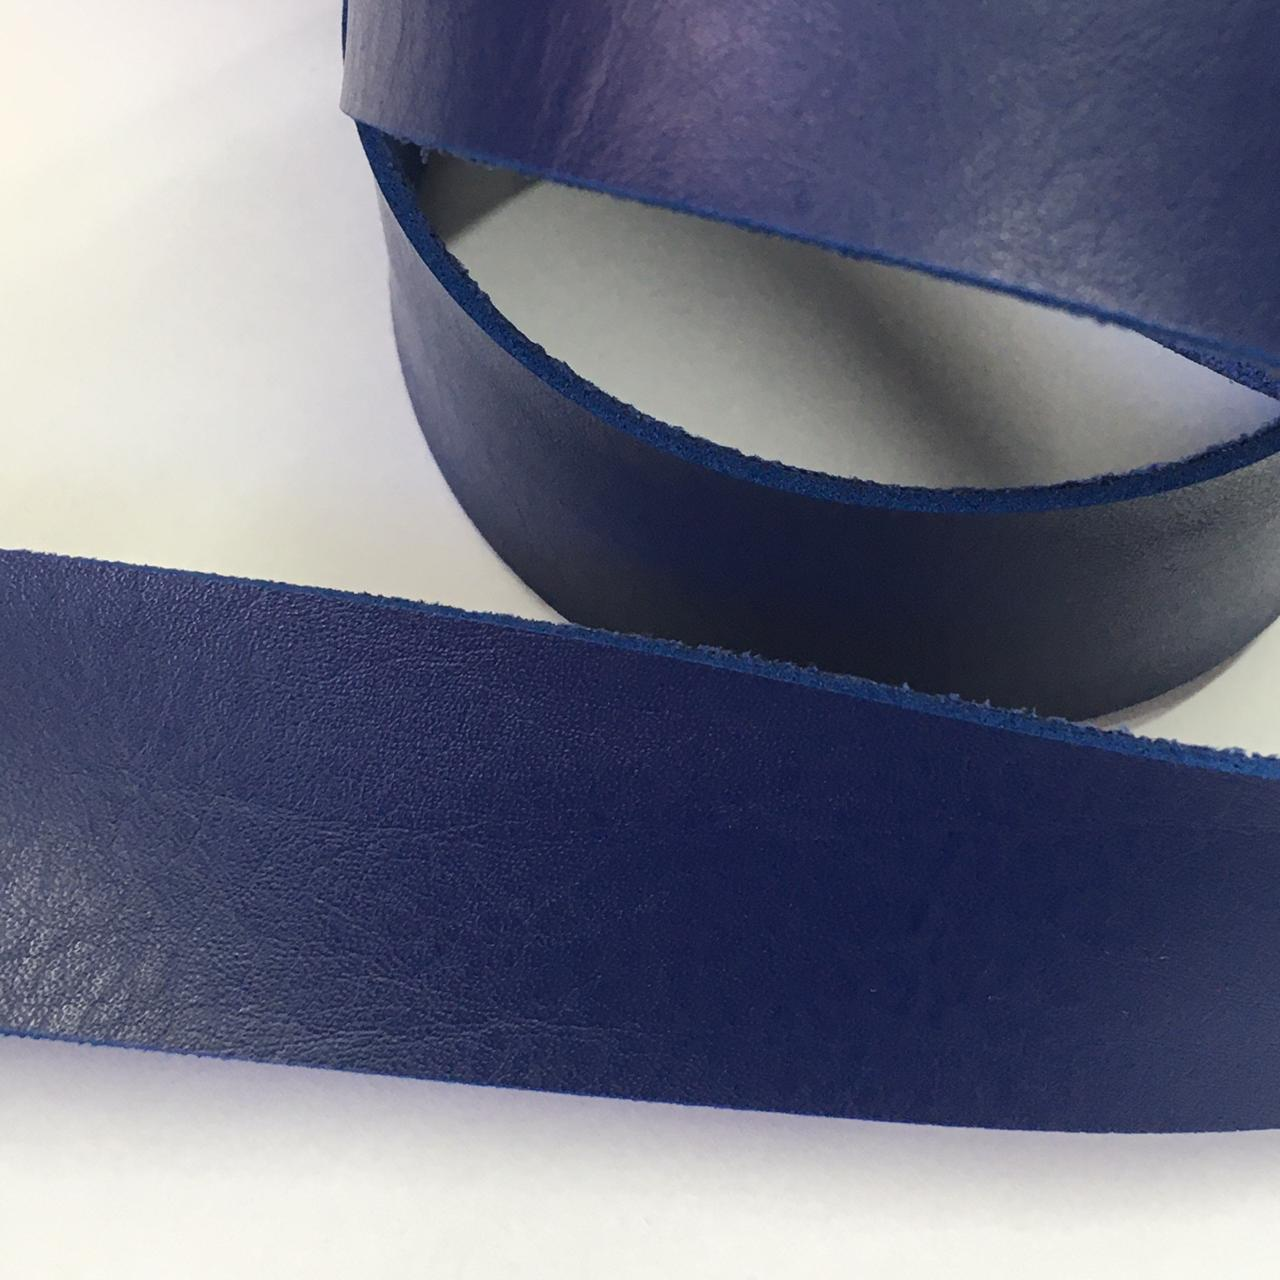 Tira Sintetico Montana 1.4 Azul Bic 3cm